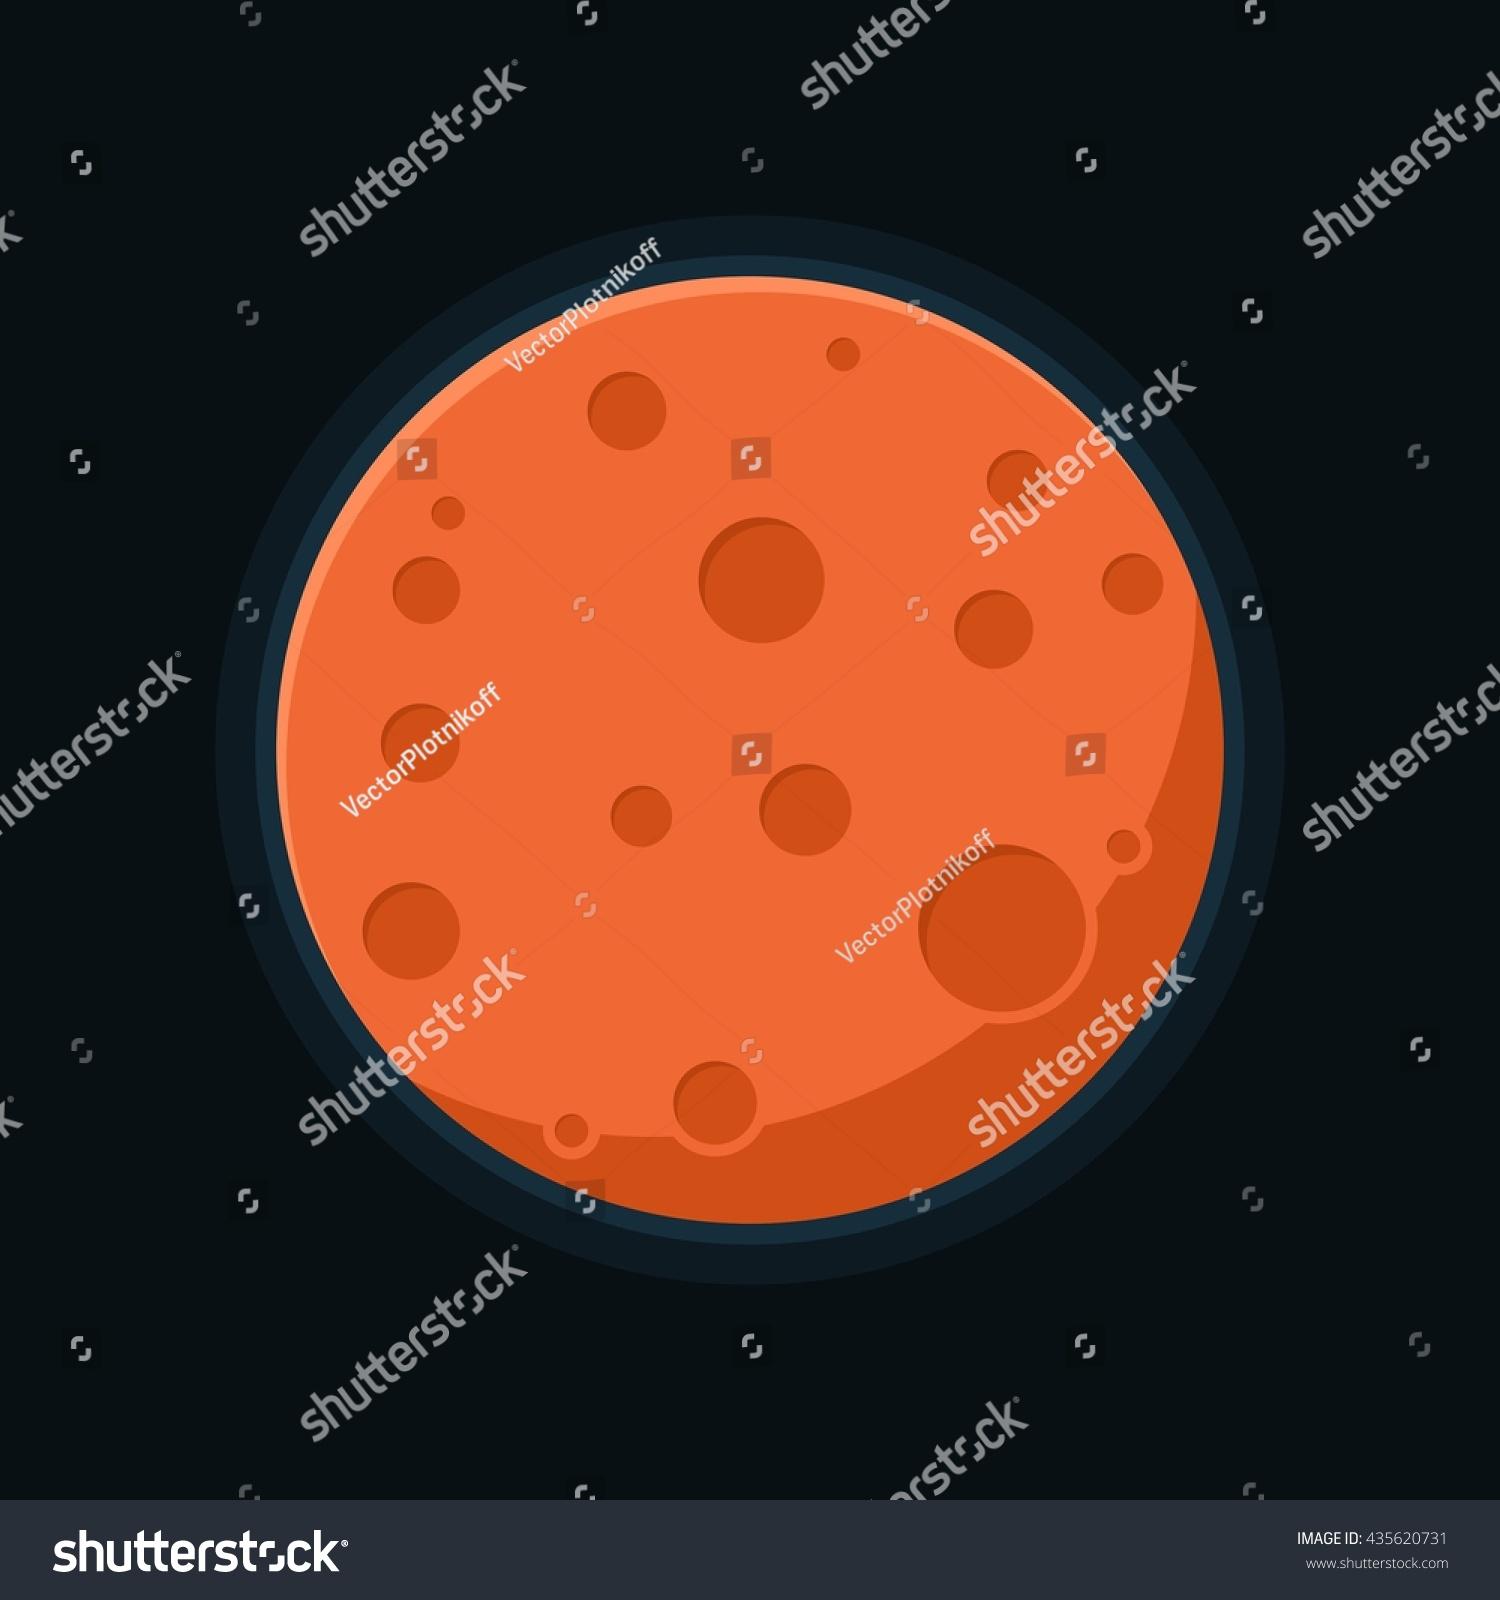 mars planet vector - photo #2